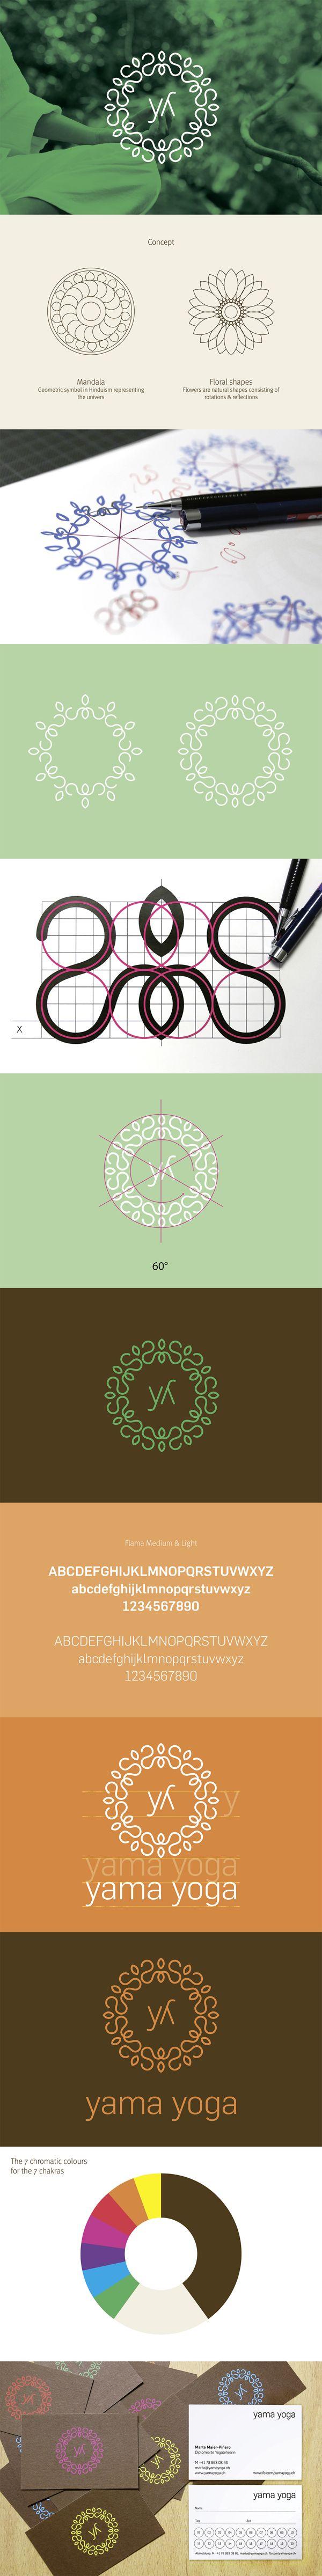 Yama Yoga branding and identity design. Beautiful on print stationary and web design.